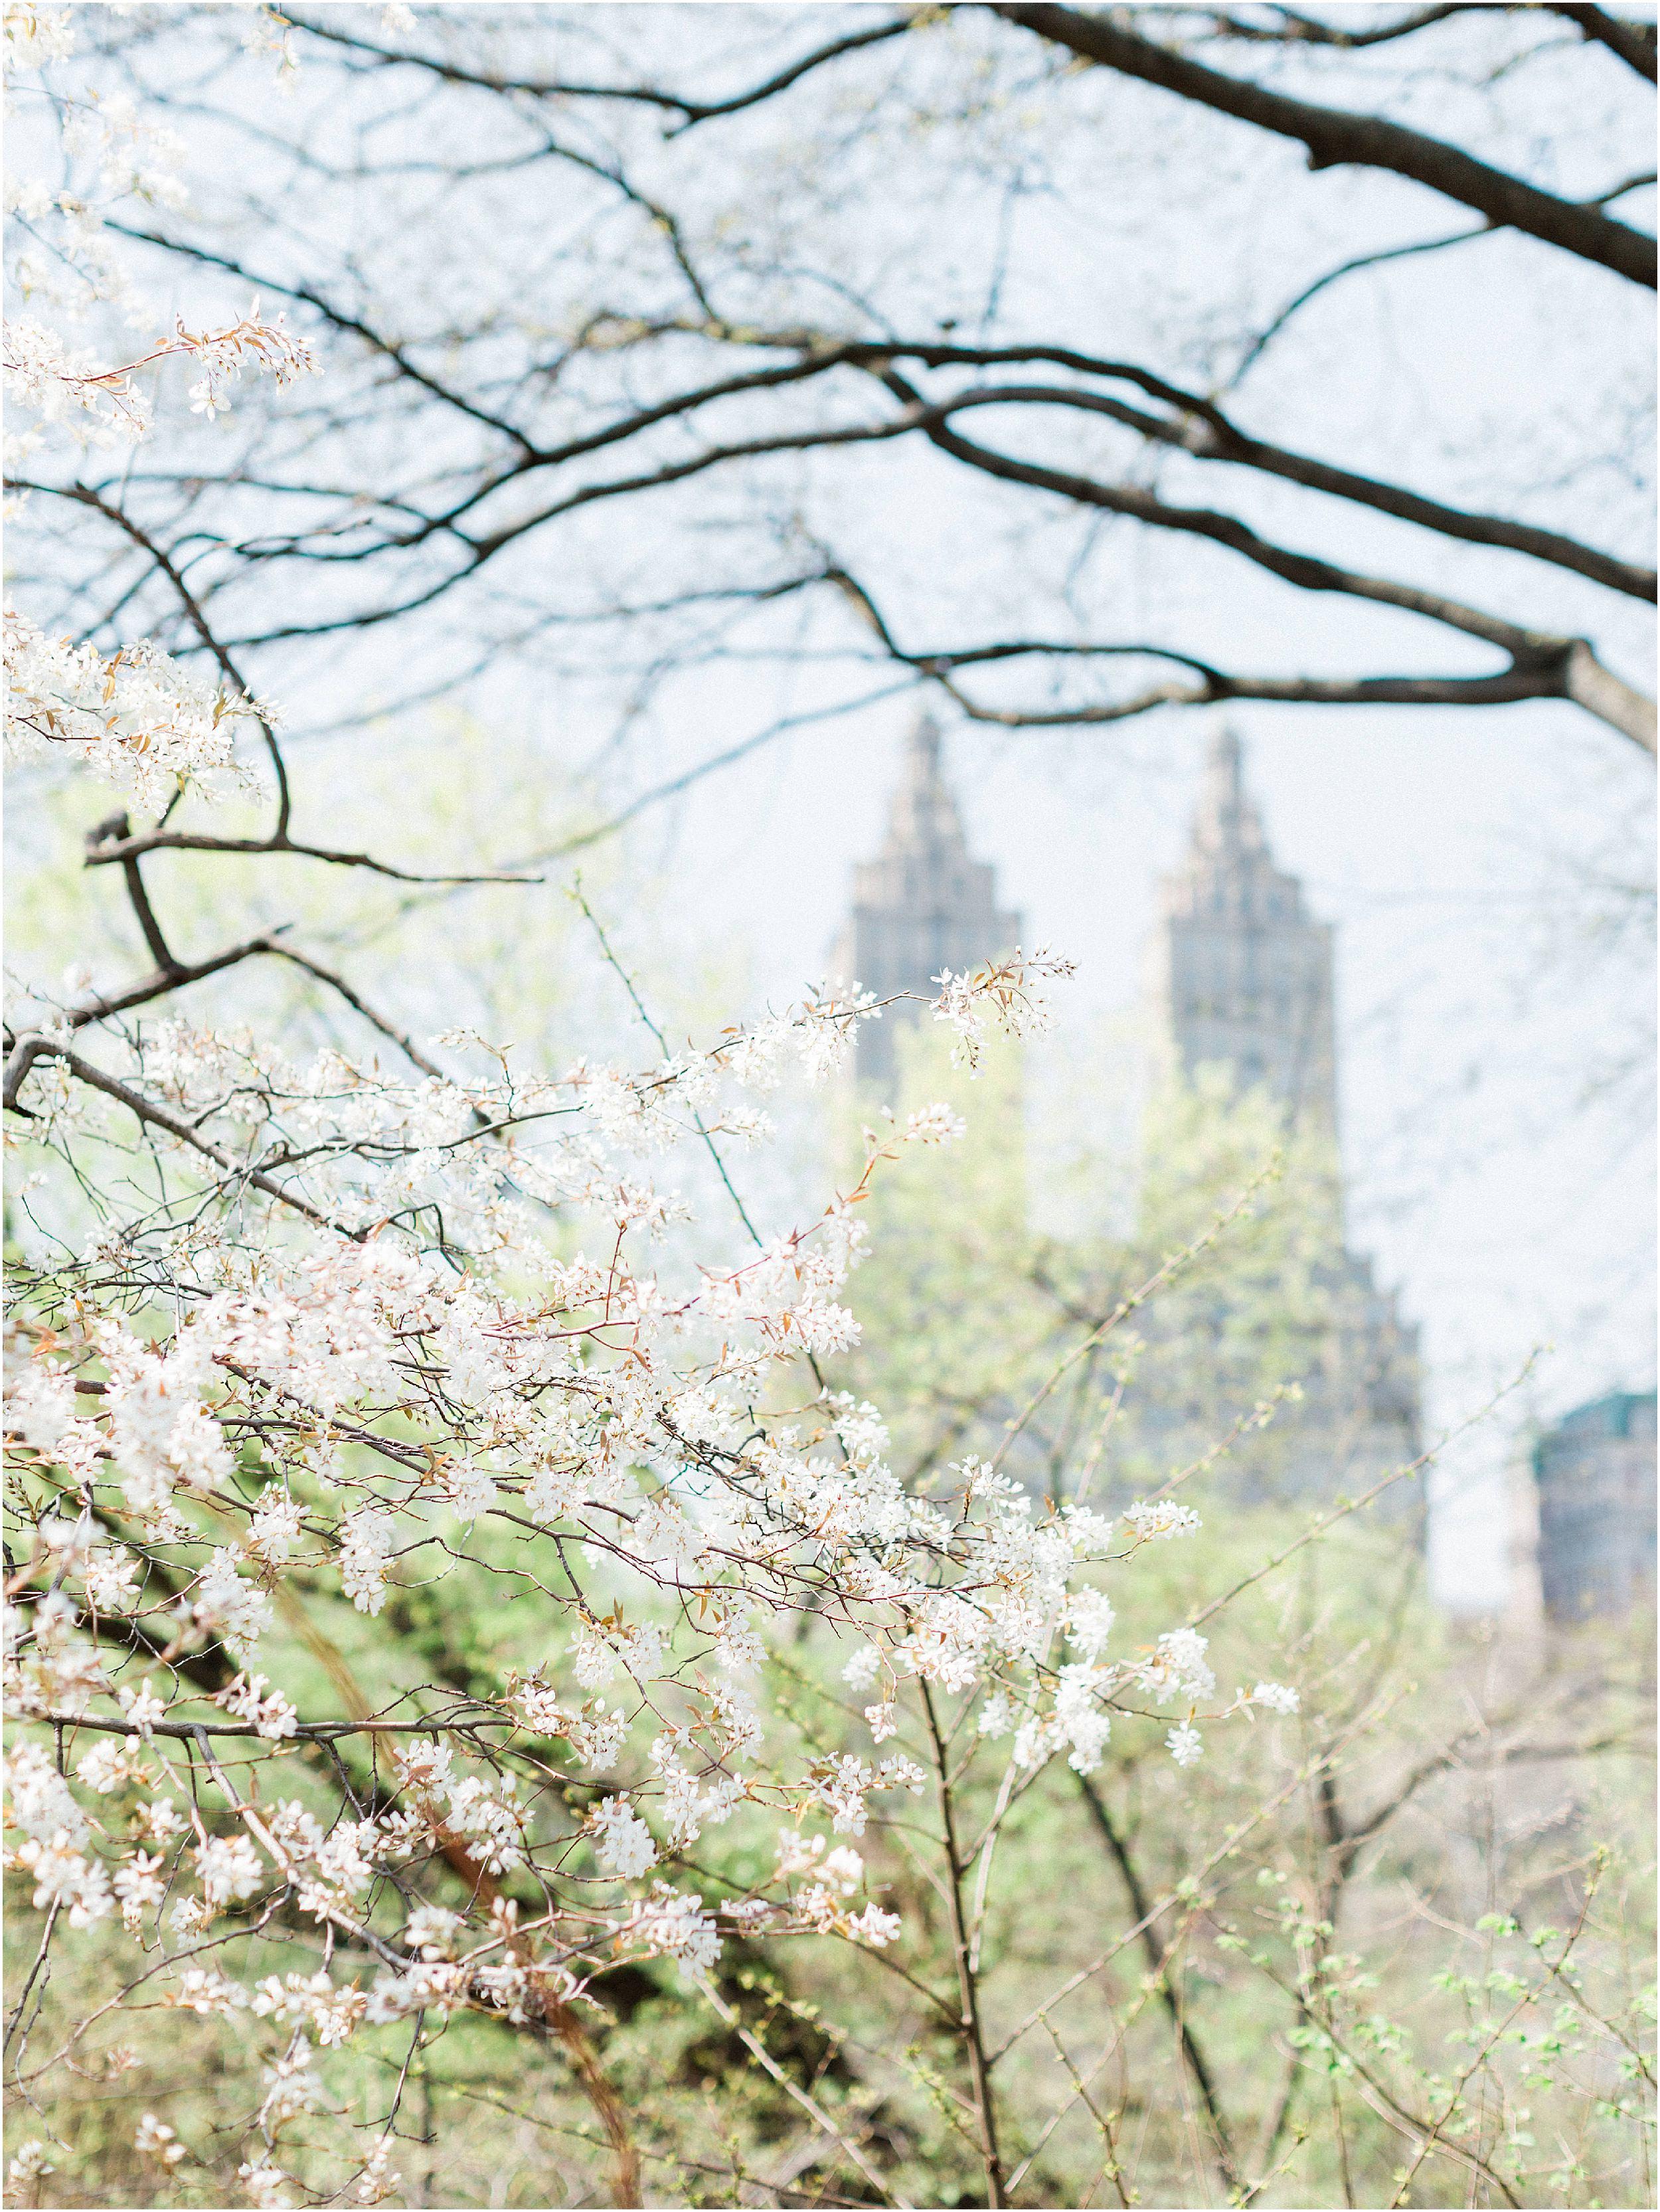 JeremiahRachelPhotography_CentralPark_NYC_SpringtimeBloom_EngagementSession0009.JPG